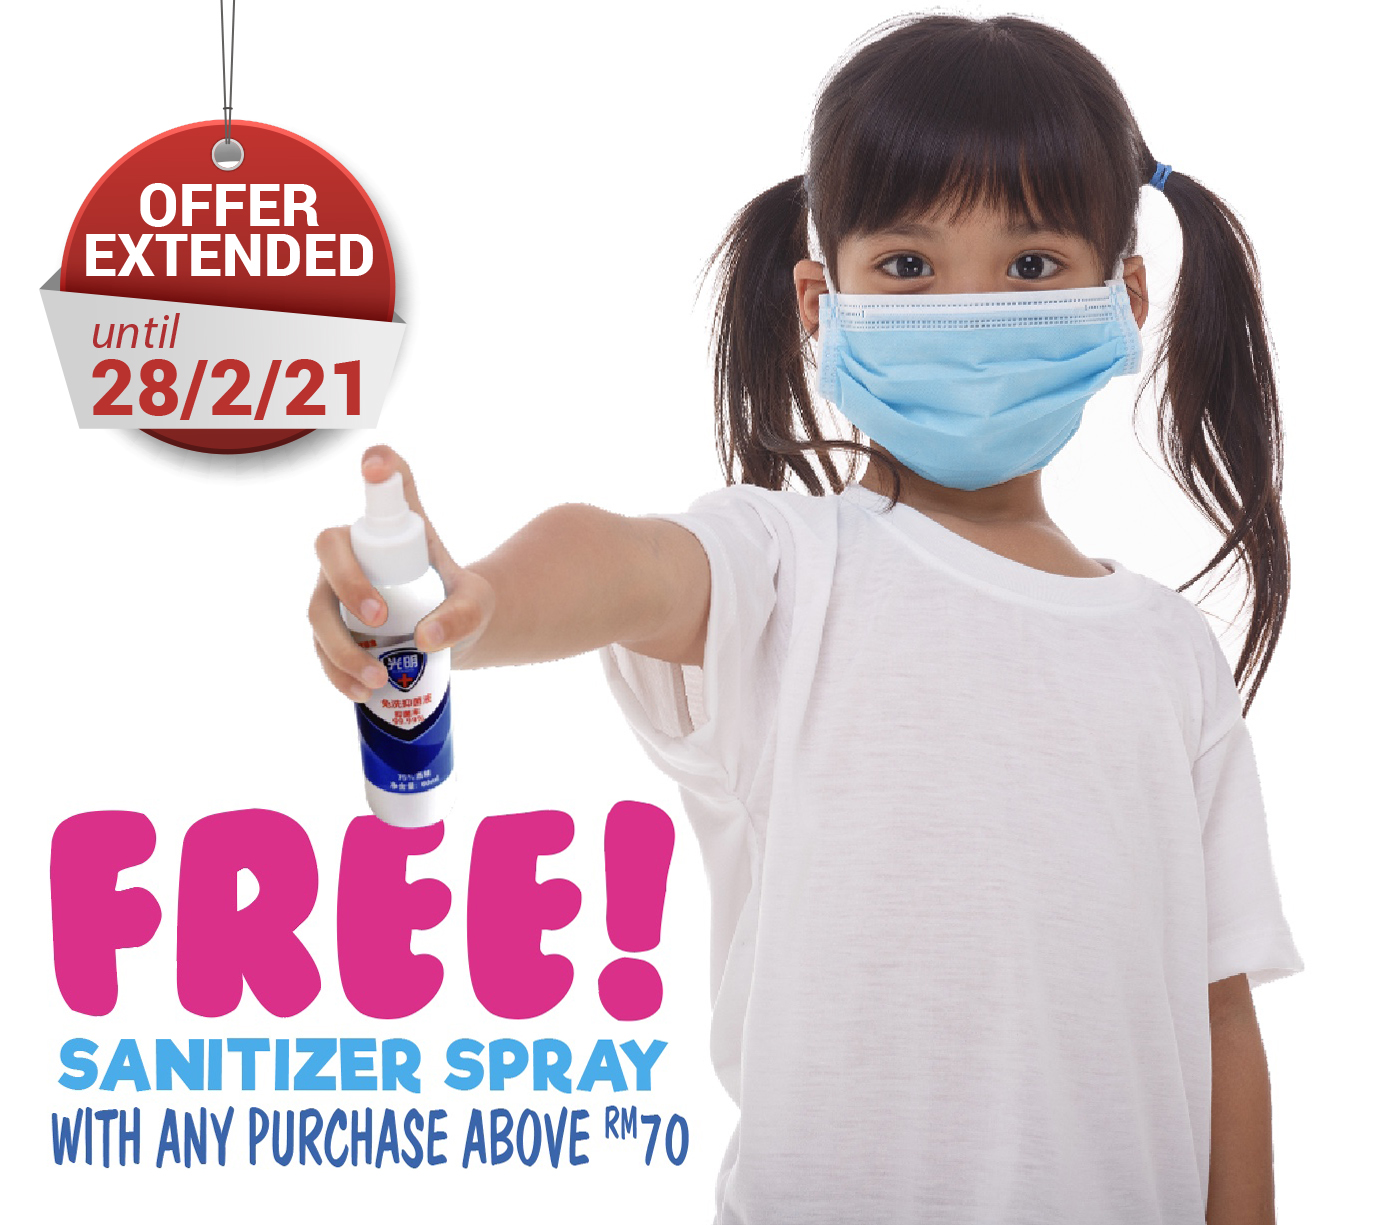 free sanitizer spray promotion